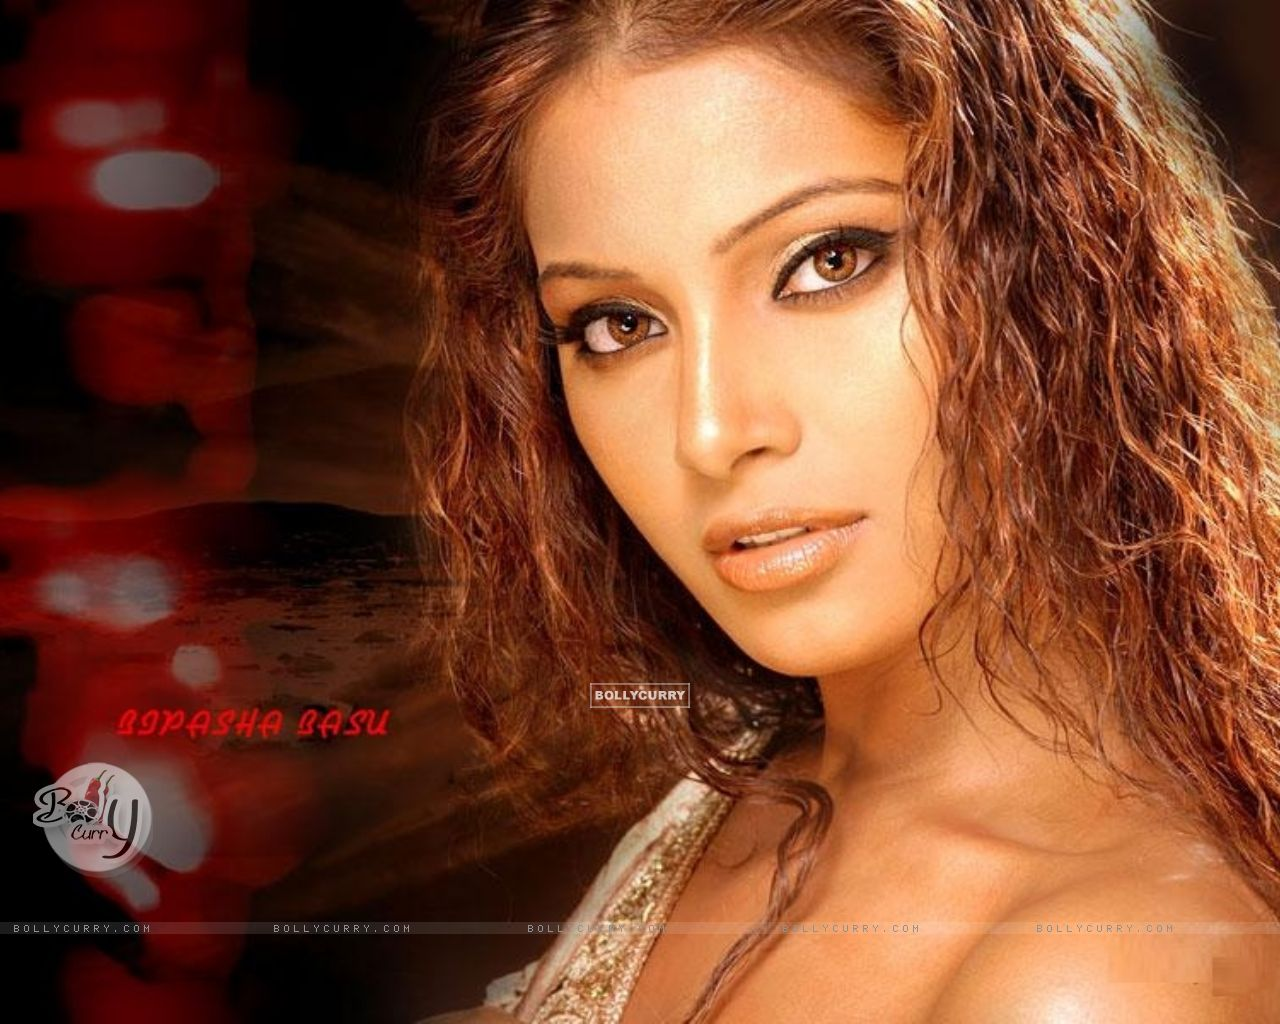 BD Actress Purnima Best Photo Gallery - Filmnstars